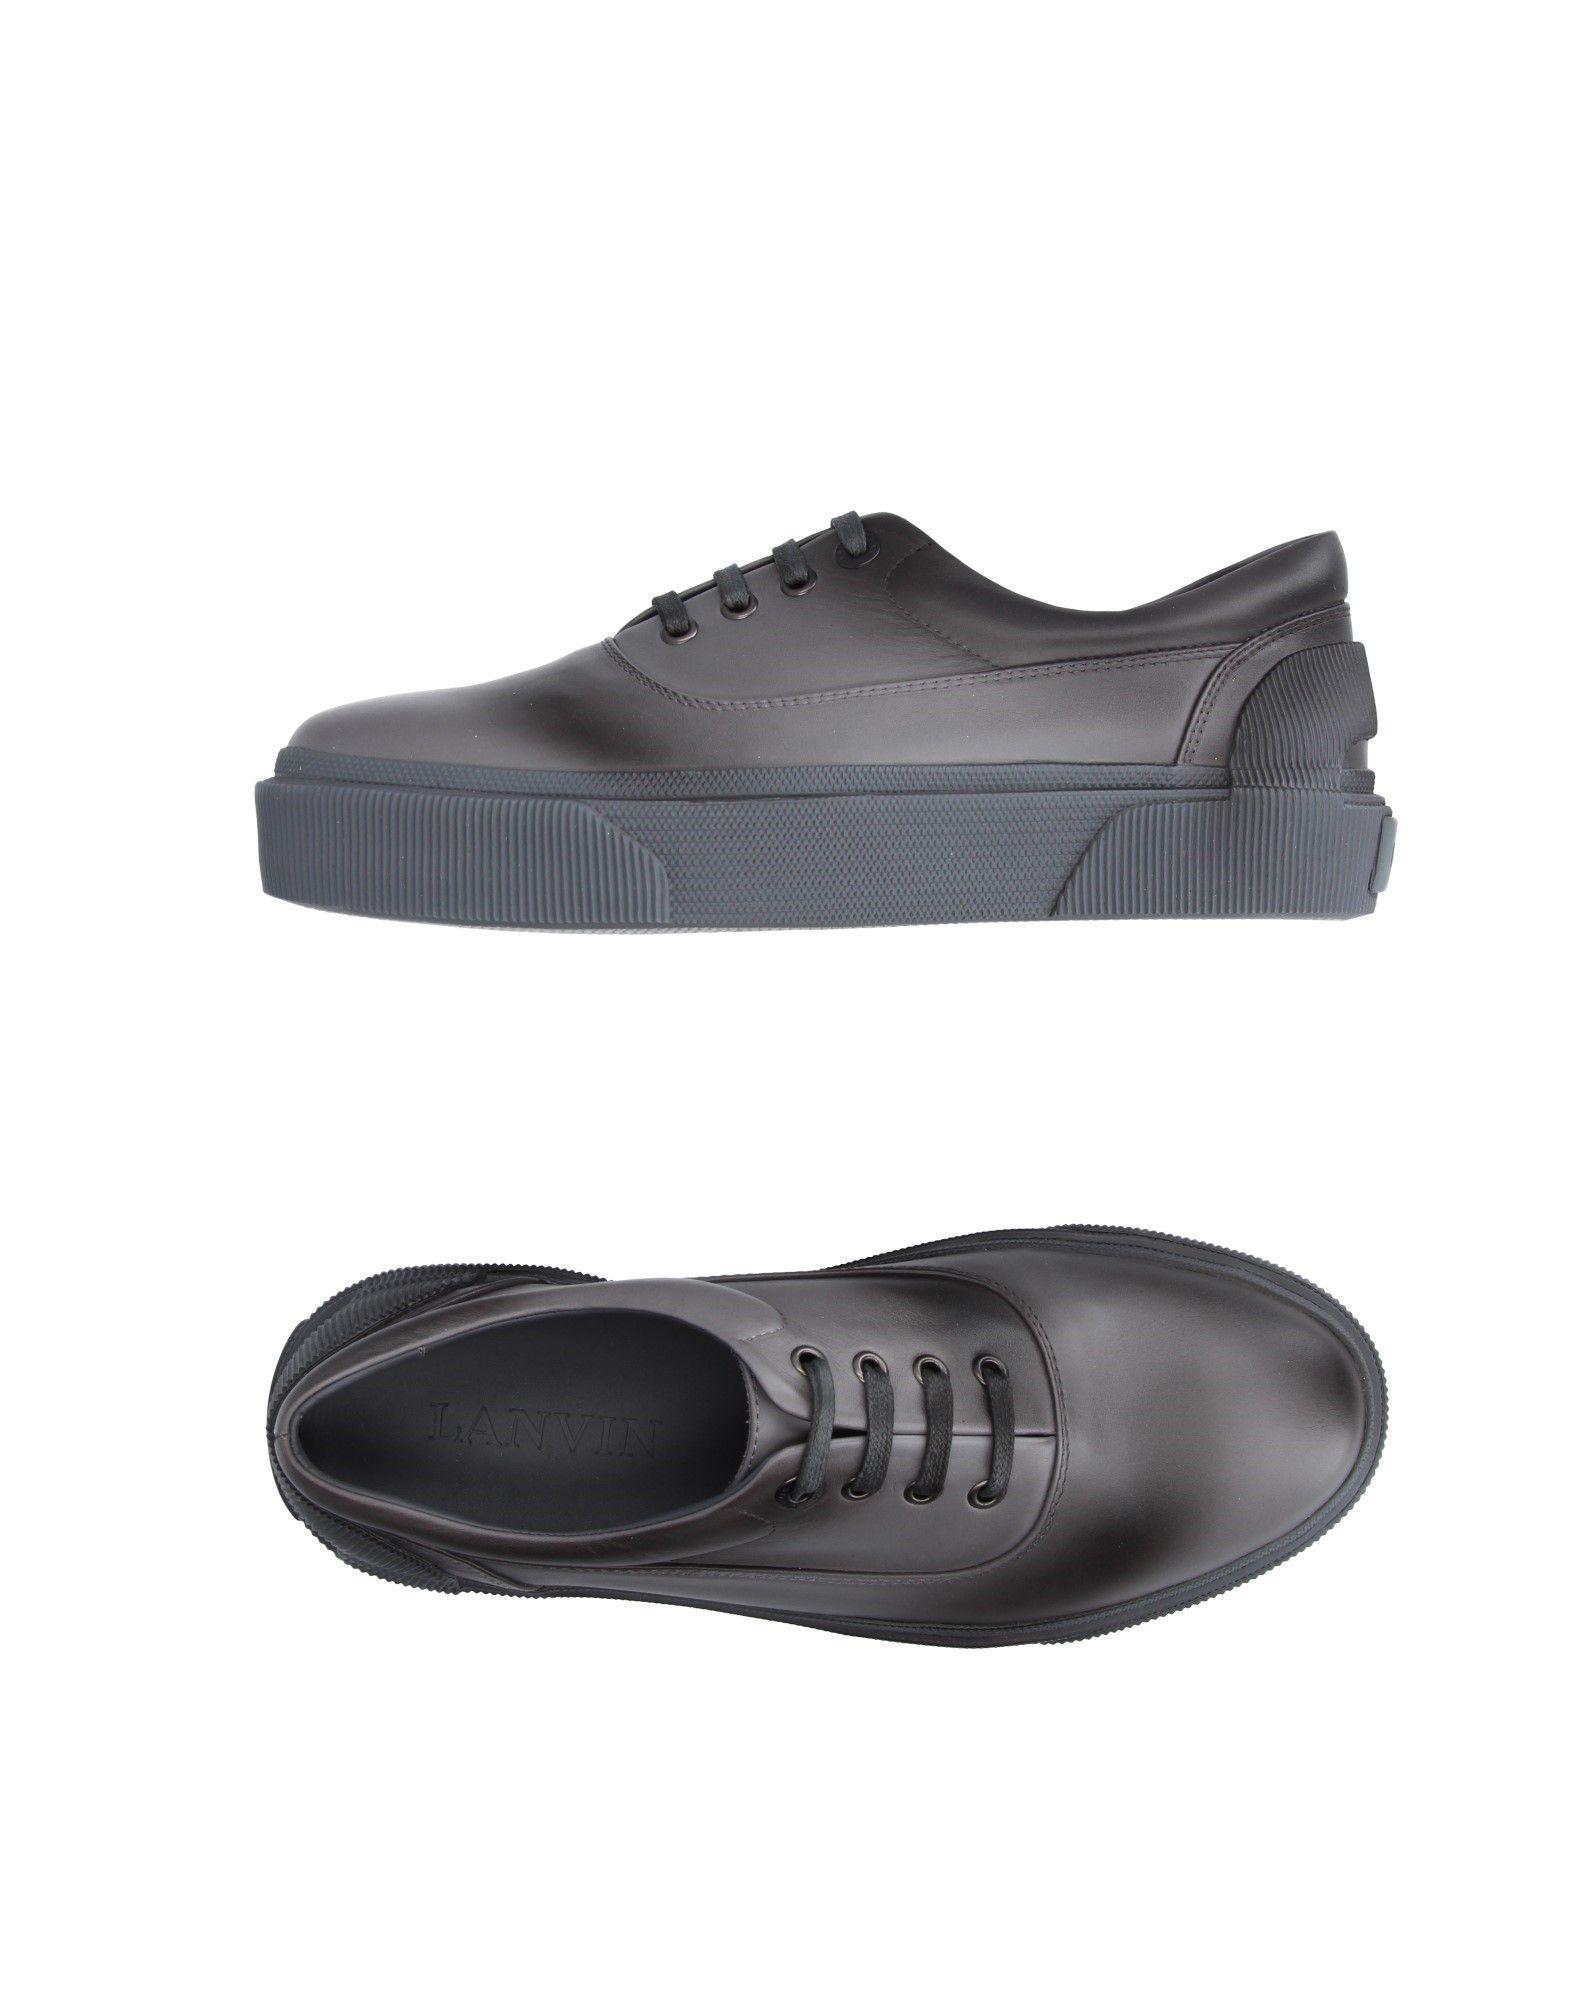 Lanvin Sneakers Herren  11215483NA Schuhe Gute Qualität beliebte Schuhe 11215483NA 64ff94